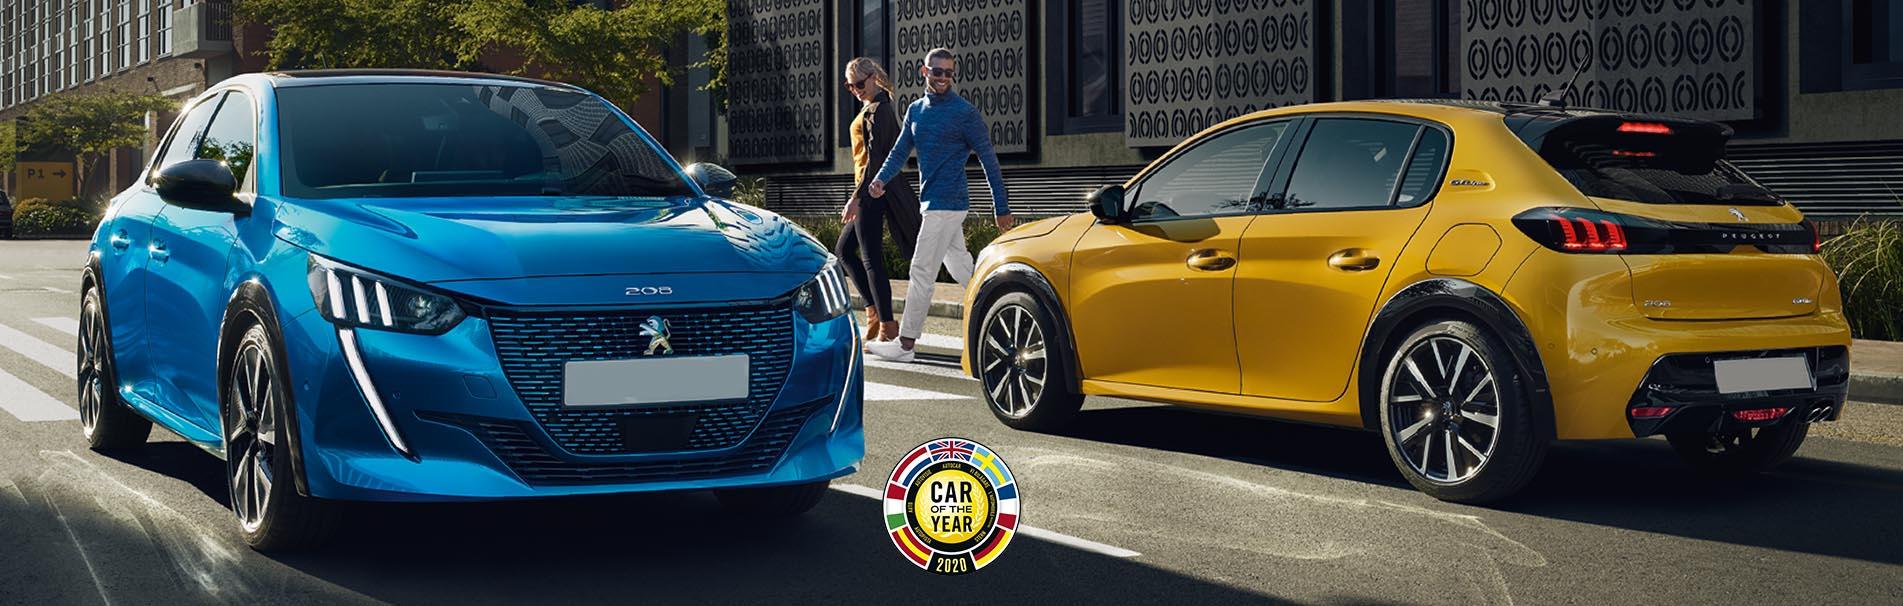 all-new-208-wins-european-car-of-the-year-2020-sli